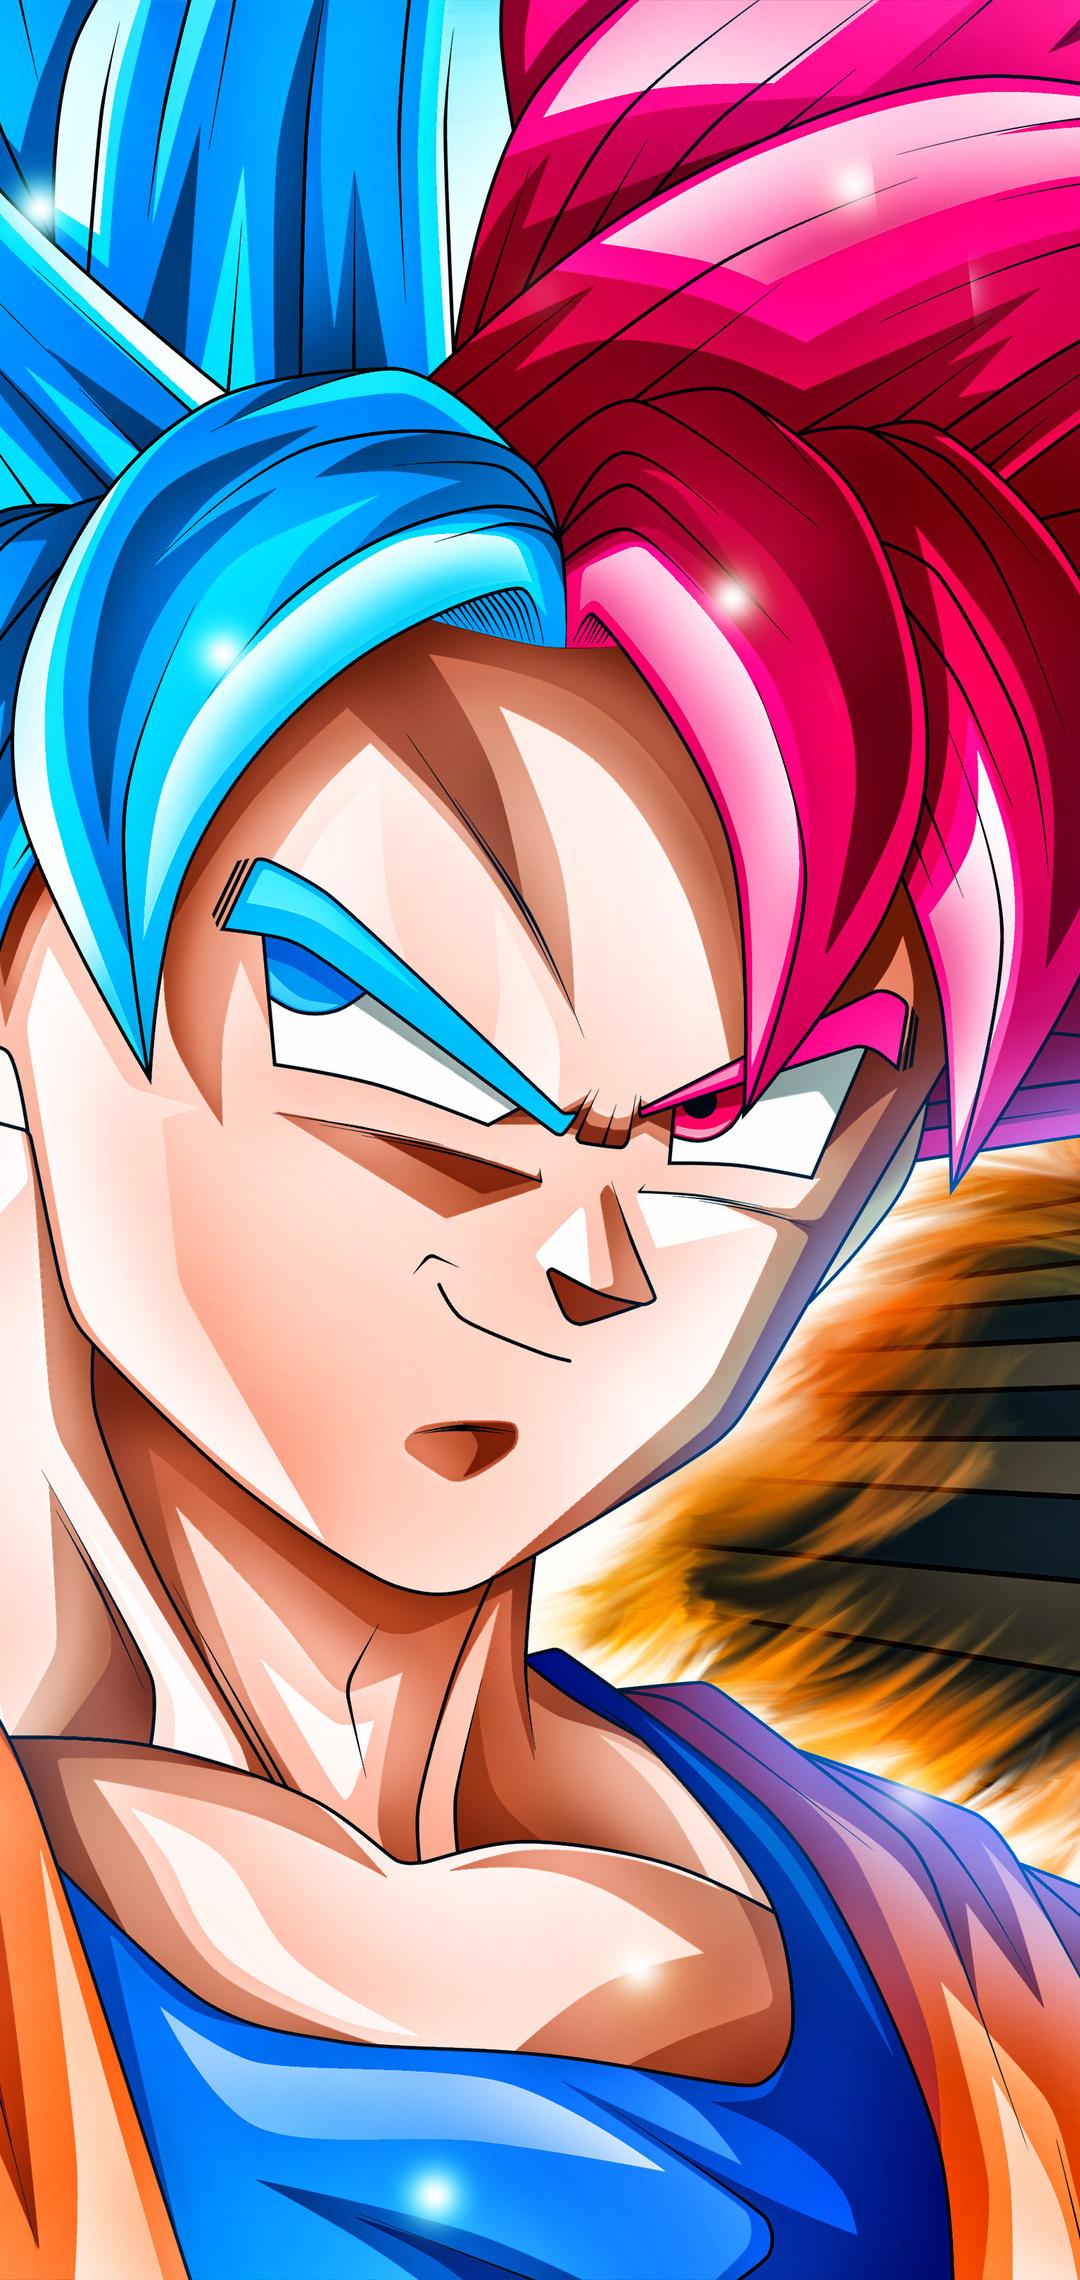 1080x2280 Goku 5k Dragon Ball Super One Plus 6 Huawei P20 Honor